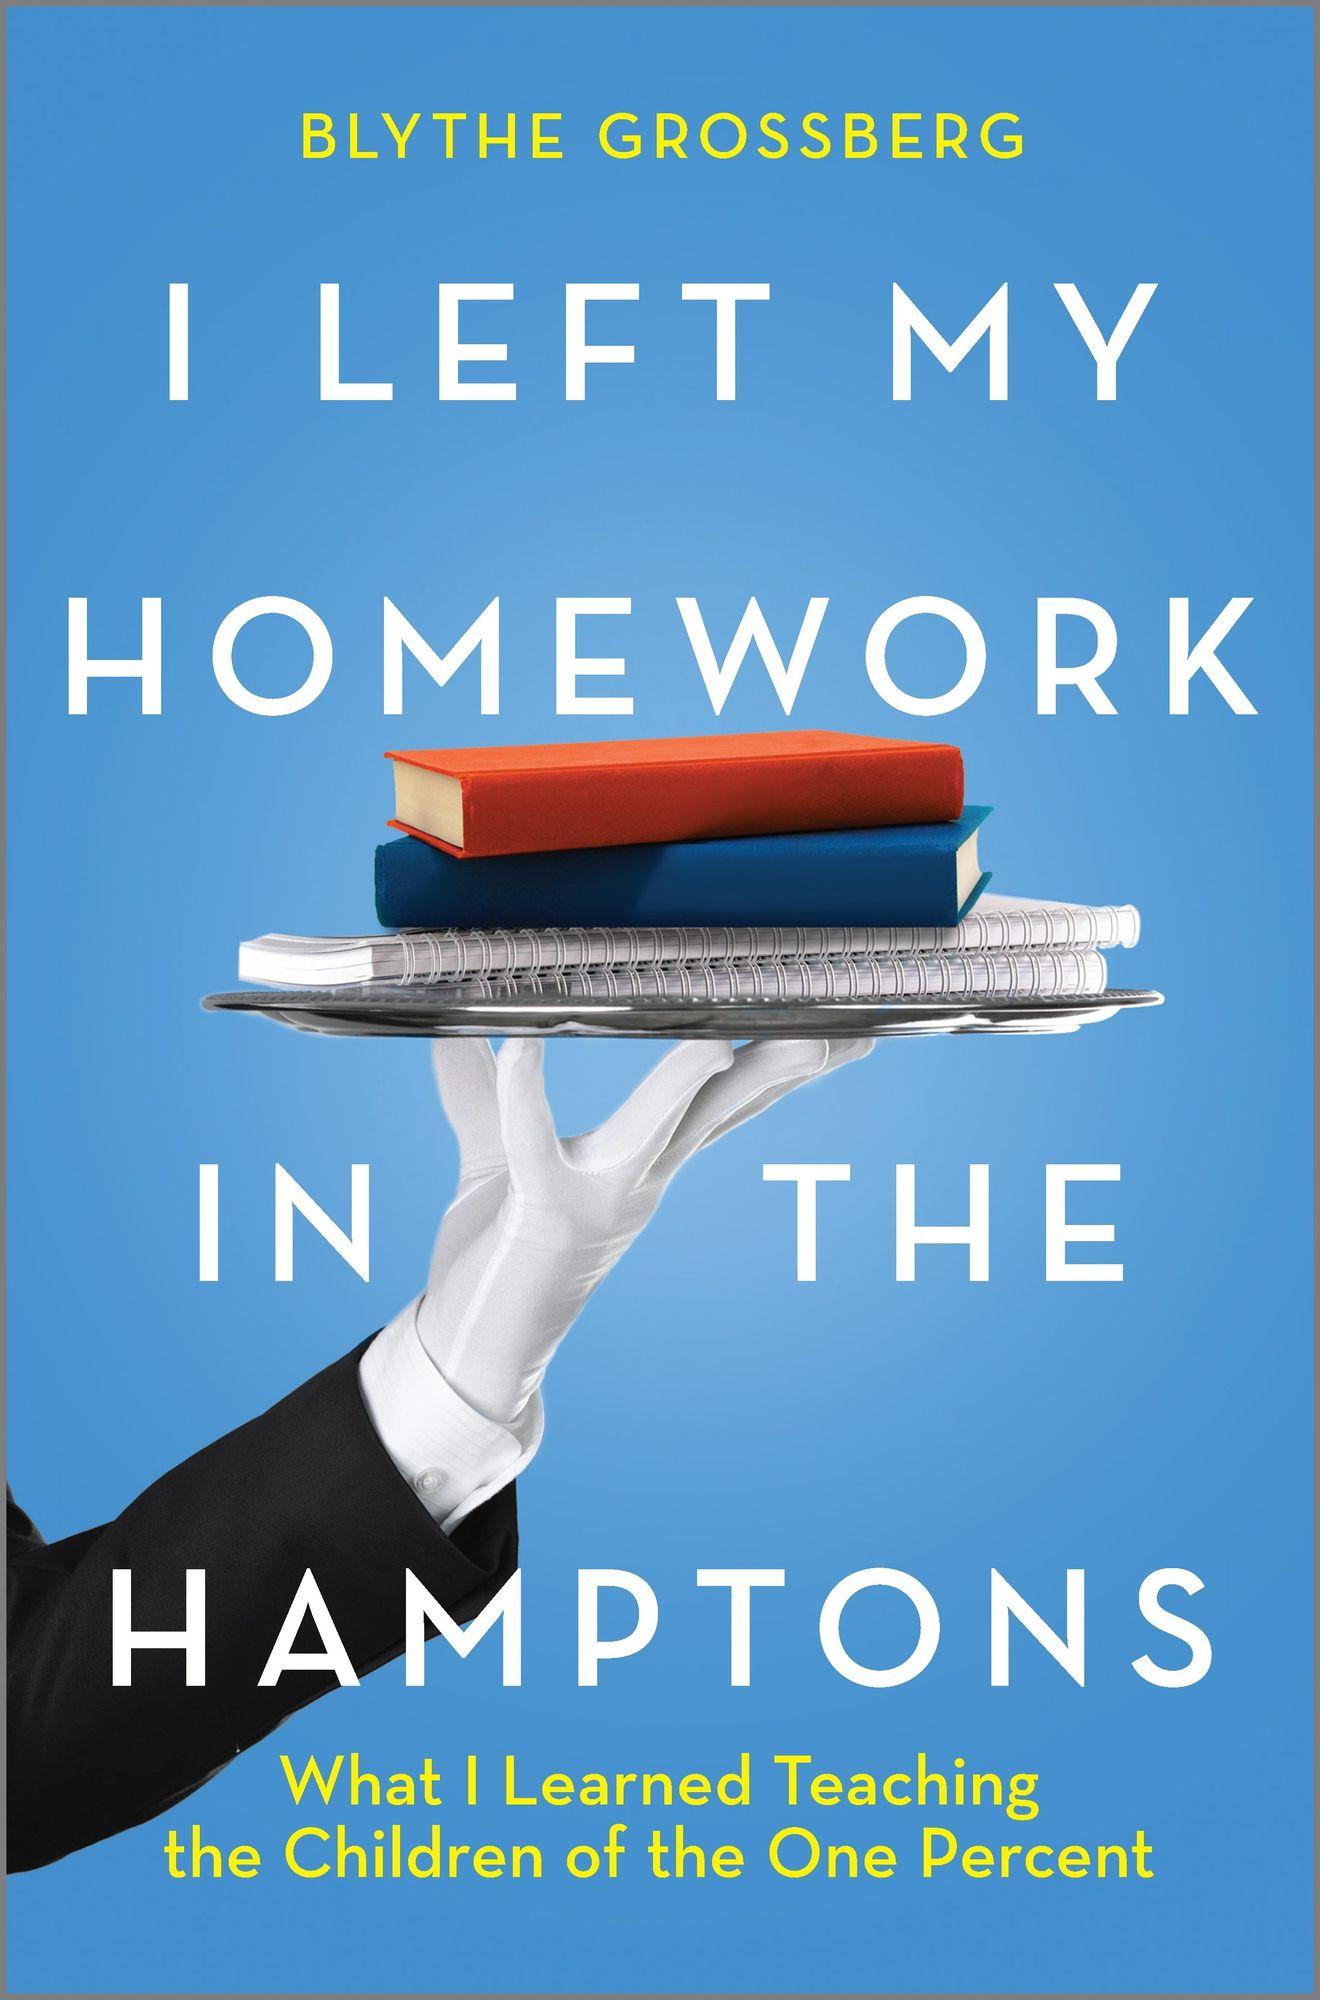 I Left My Homework in the Hamptons by Blythe Grossberg